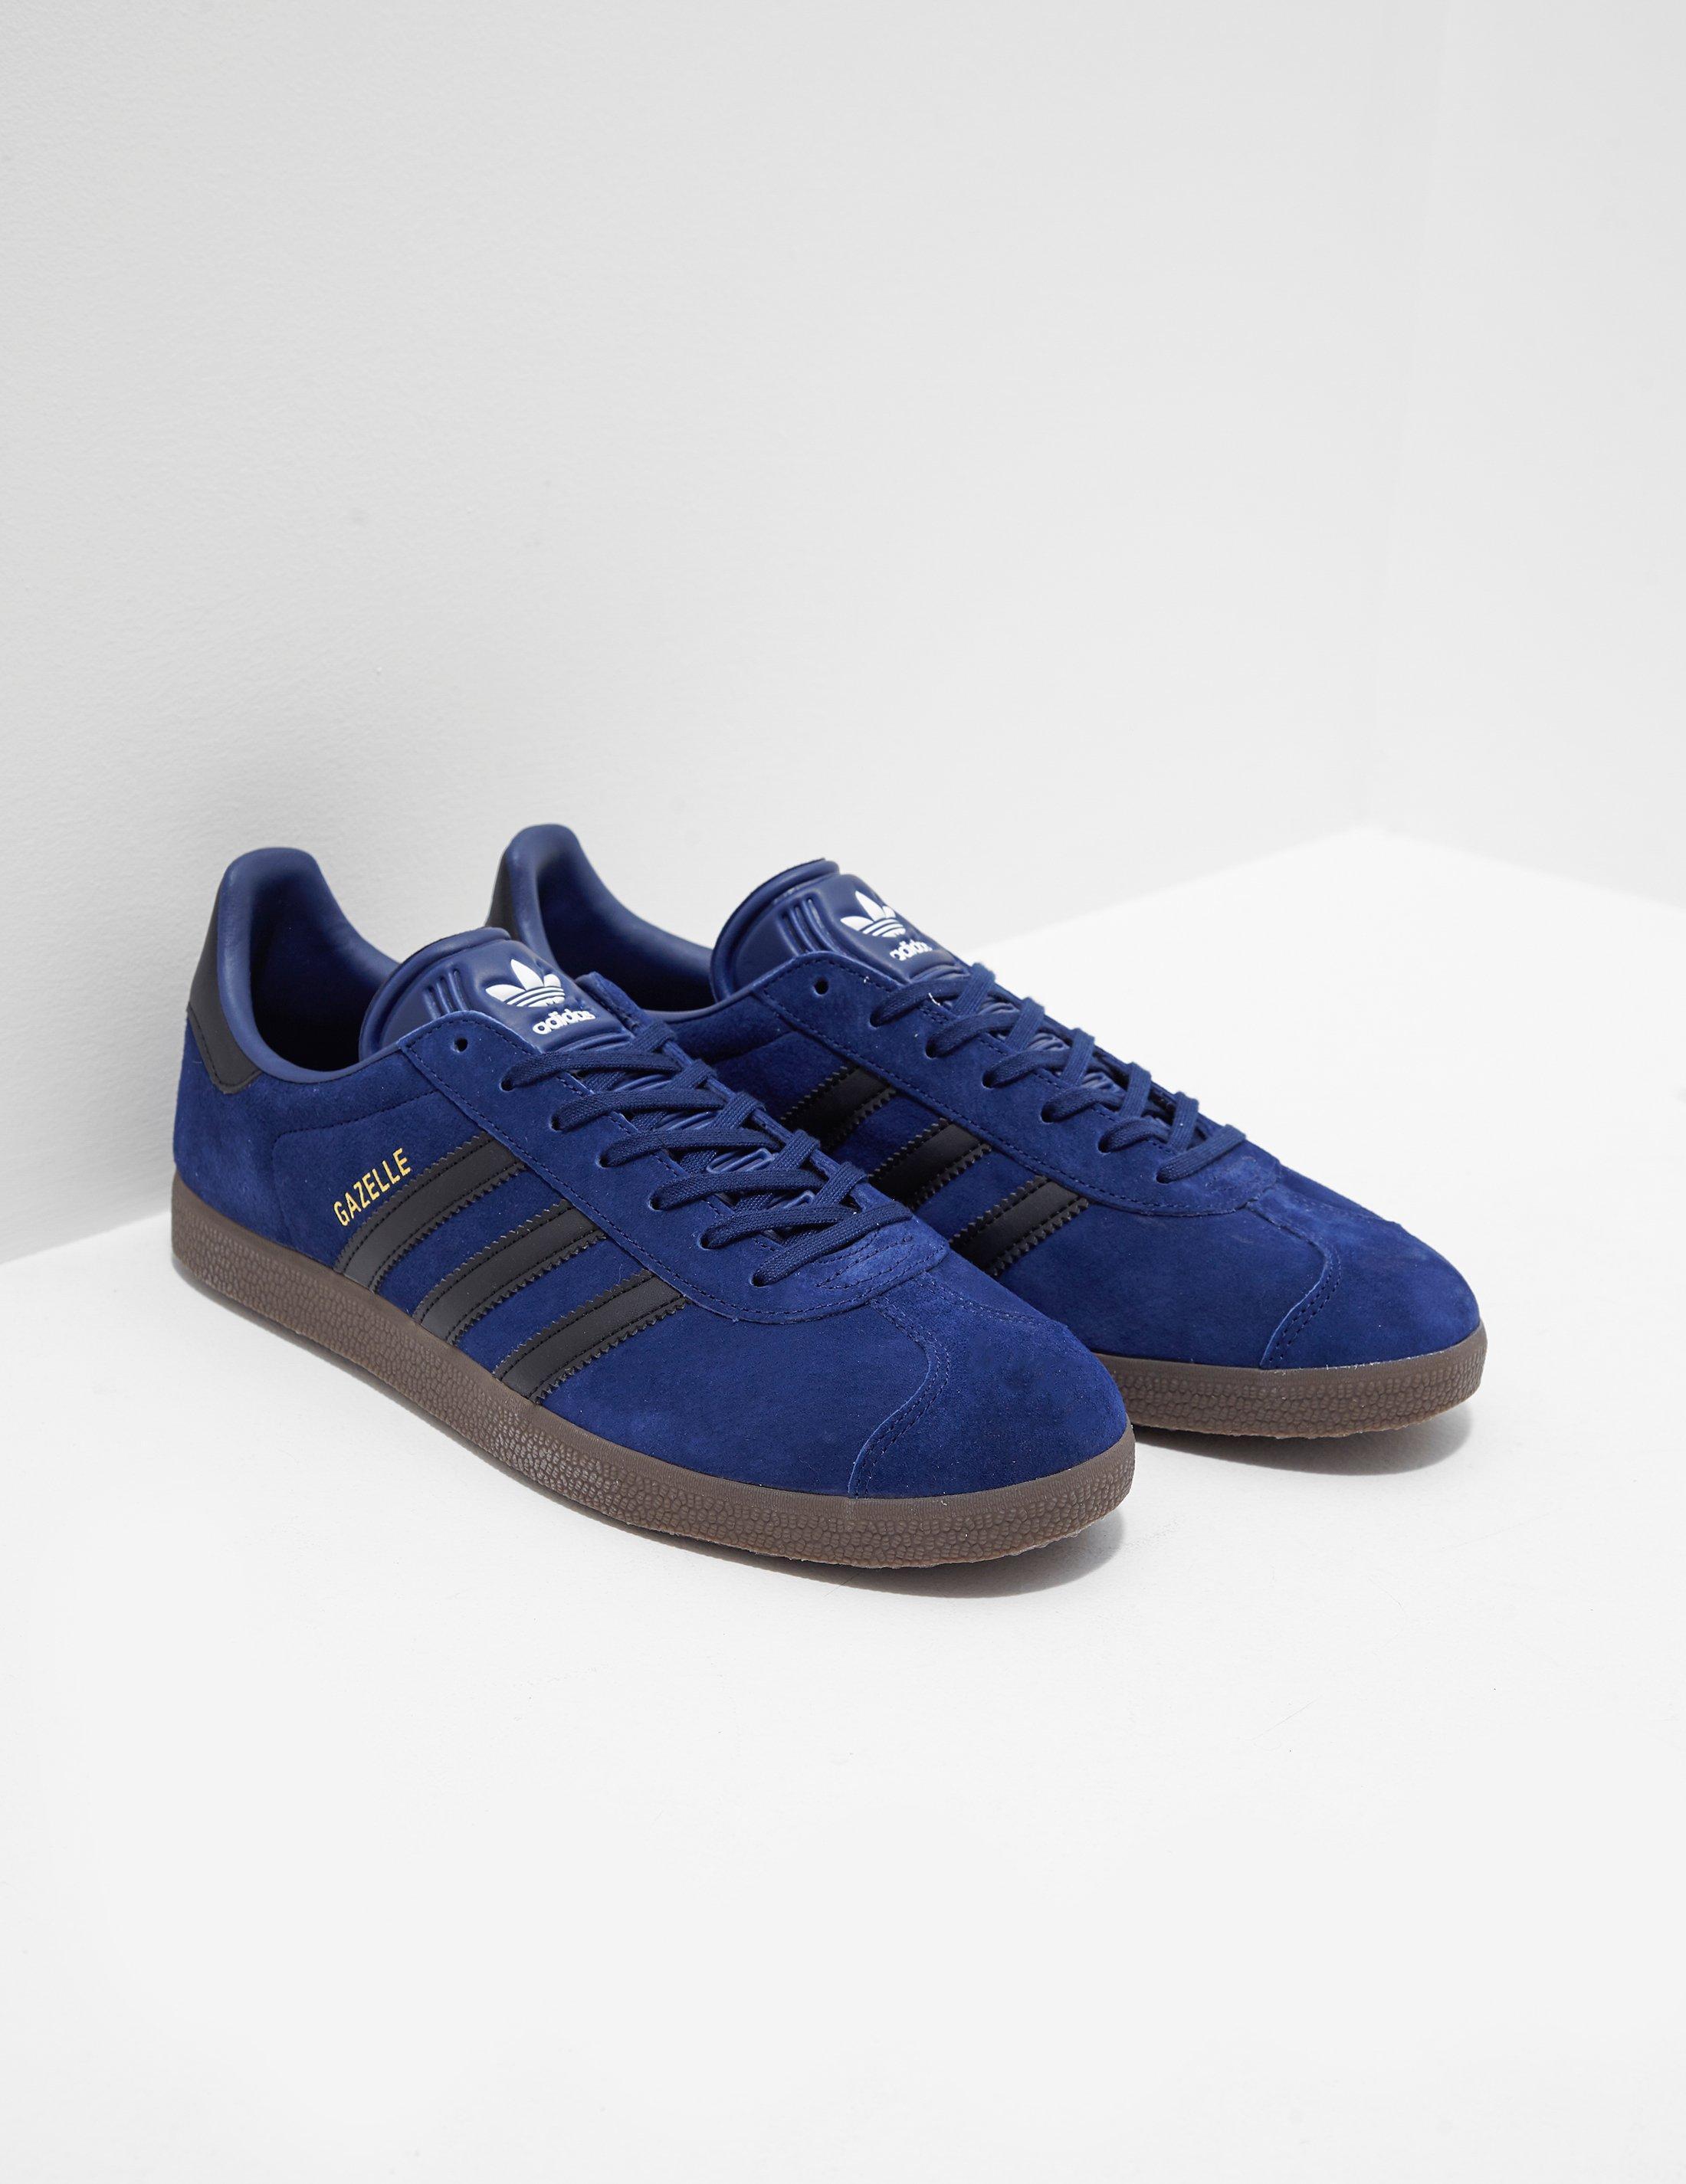 timeless design ffaa0 2f464 adidas Originals. Mens Gazelle Blue